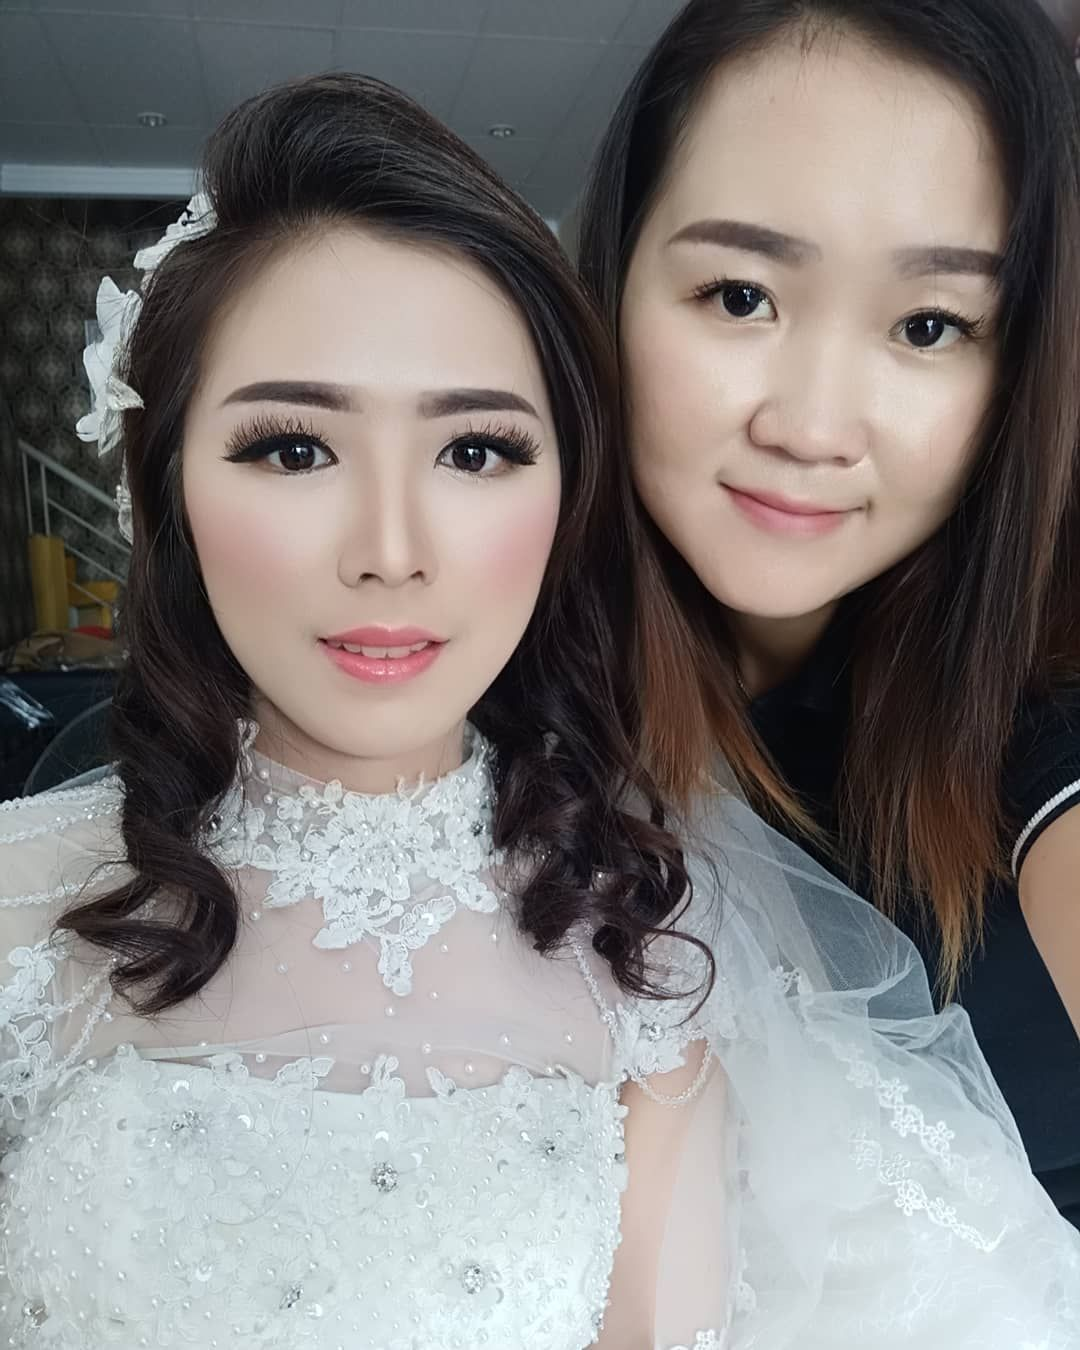 Korean Make Up Wedding Style Kesampean Juga Akhir Nyaahh Dah Lama Mau Make Up Ala Korea Ayoo Siapa Lagi Yg Mau D Mke Up Ala Ala Korea Di Hri Wedding N